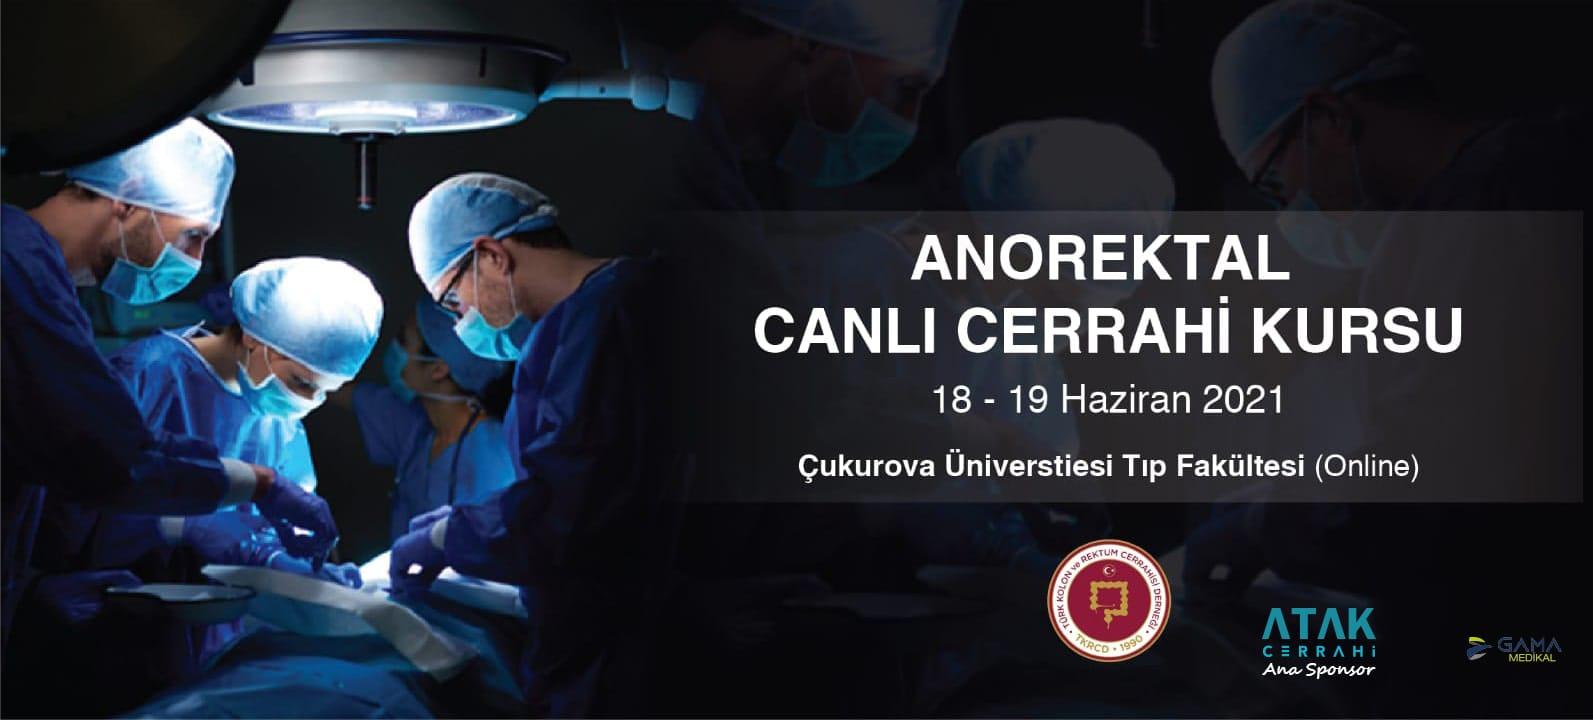 I. Anorektal Canlı Cerrahi Kursu (Online)